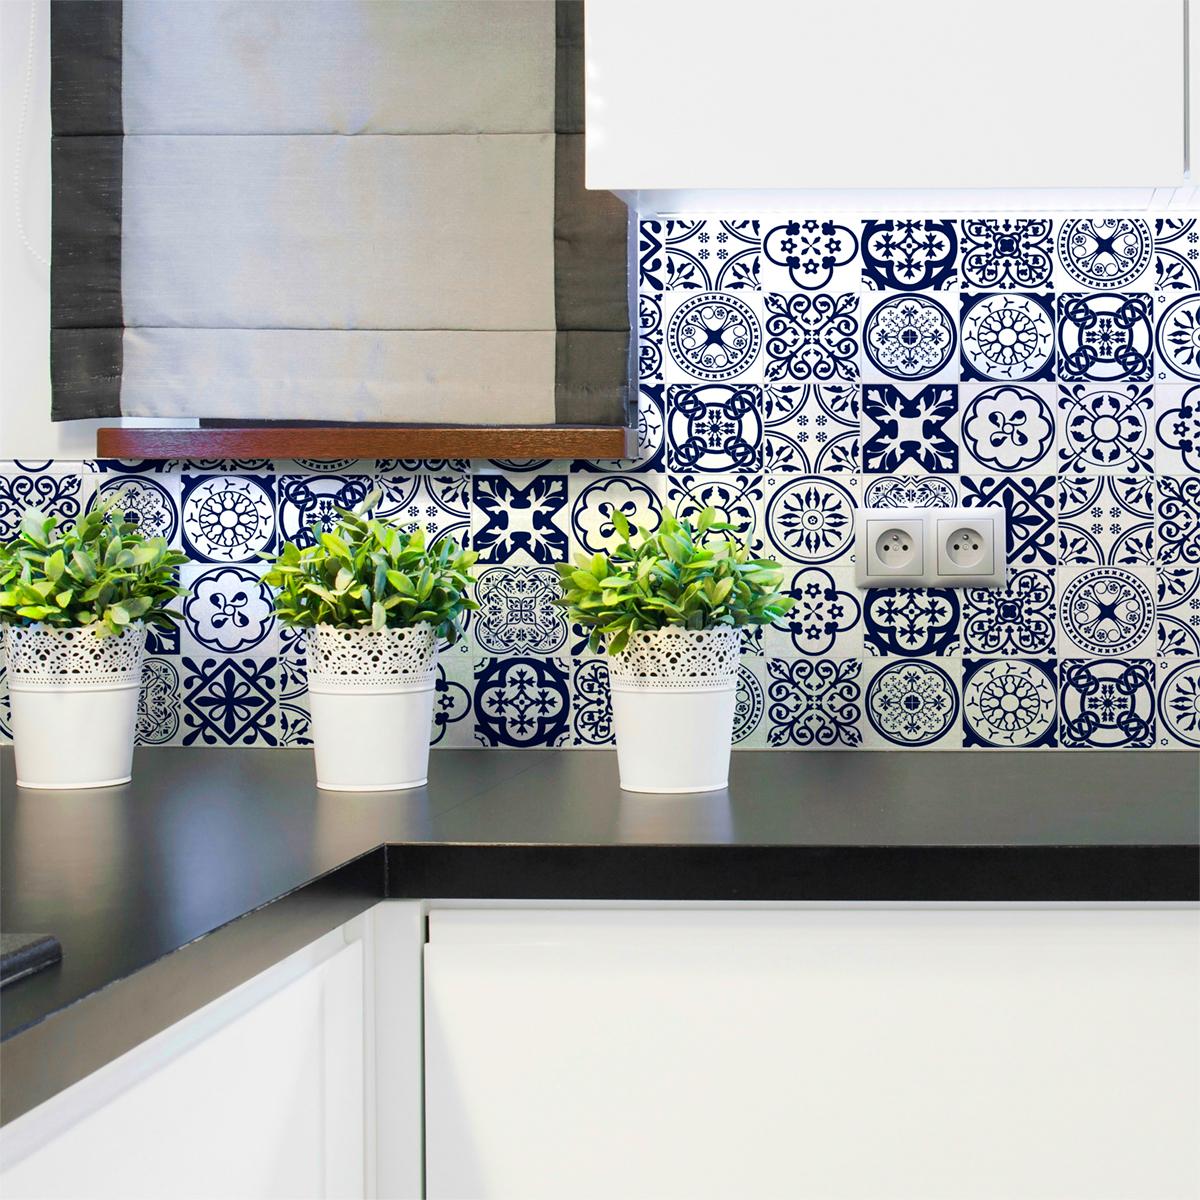 16 stickers carrelages azulejos ornements florales bleu. Black Bedroom Furniture Sets. Home Design Ideas